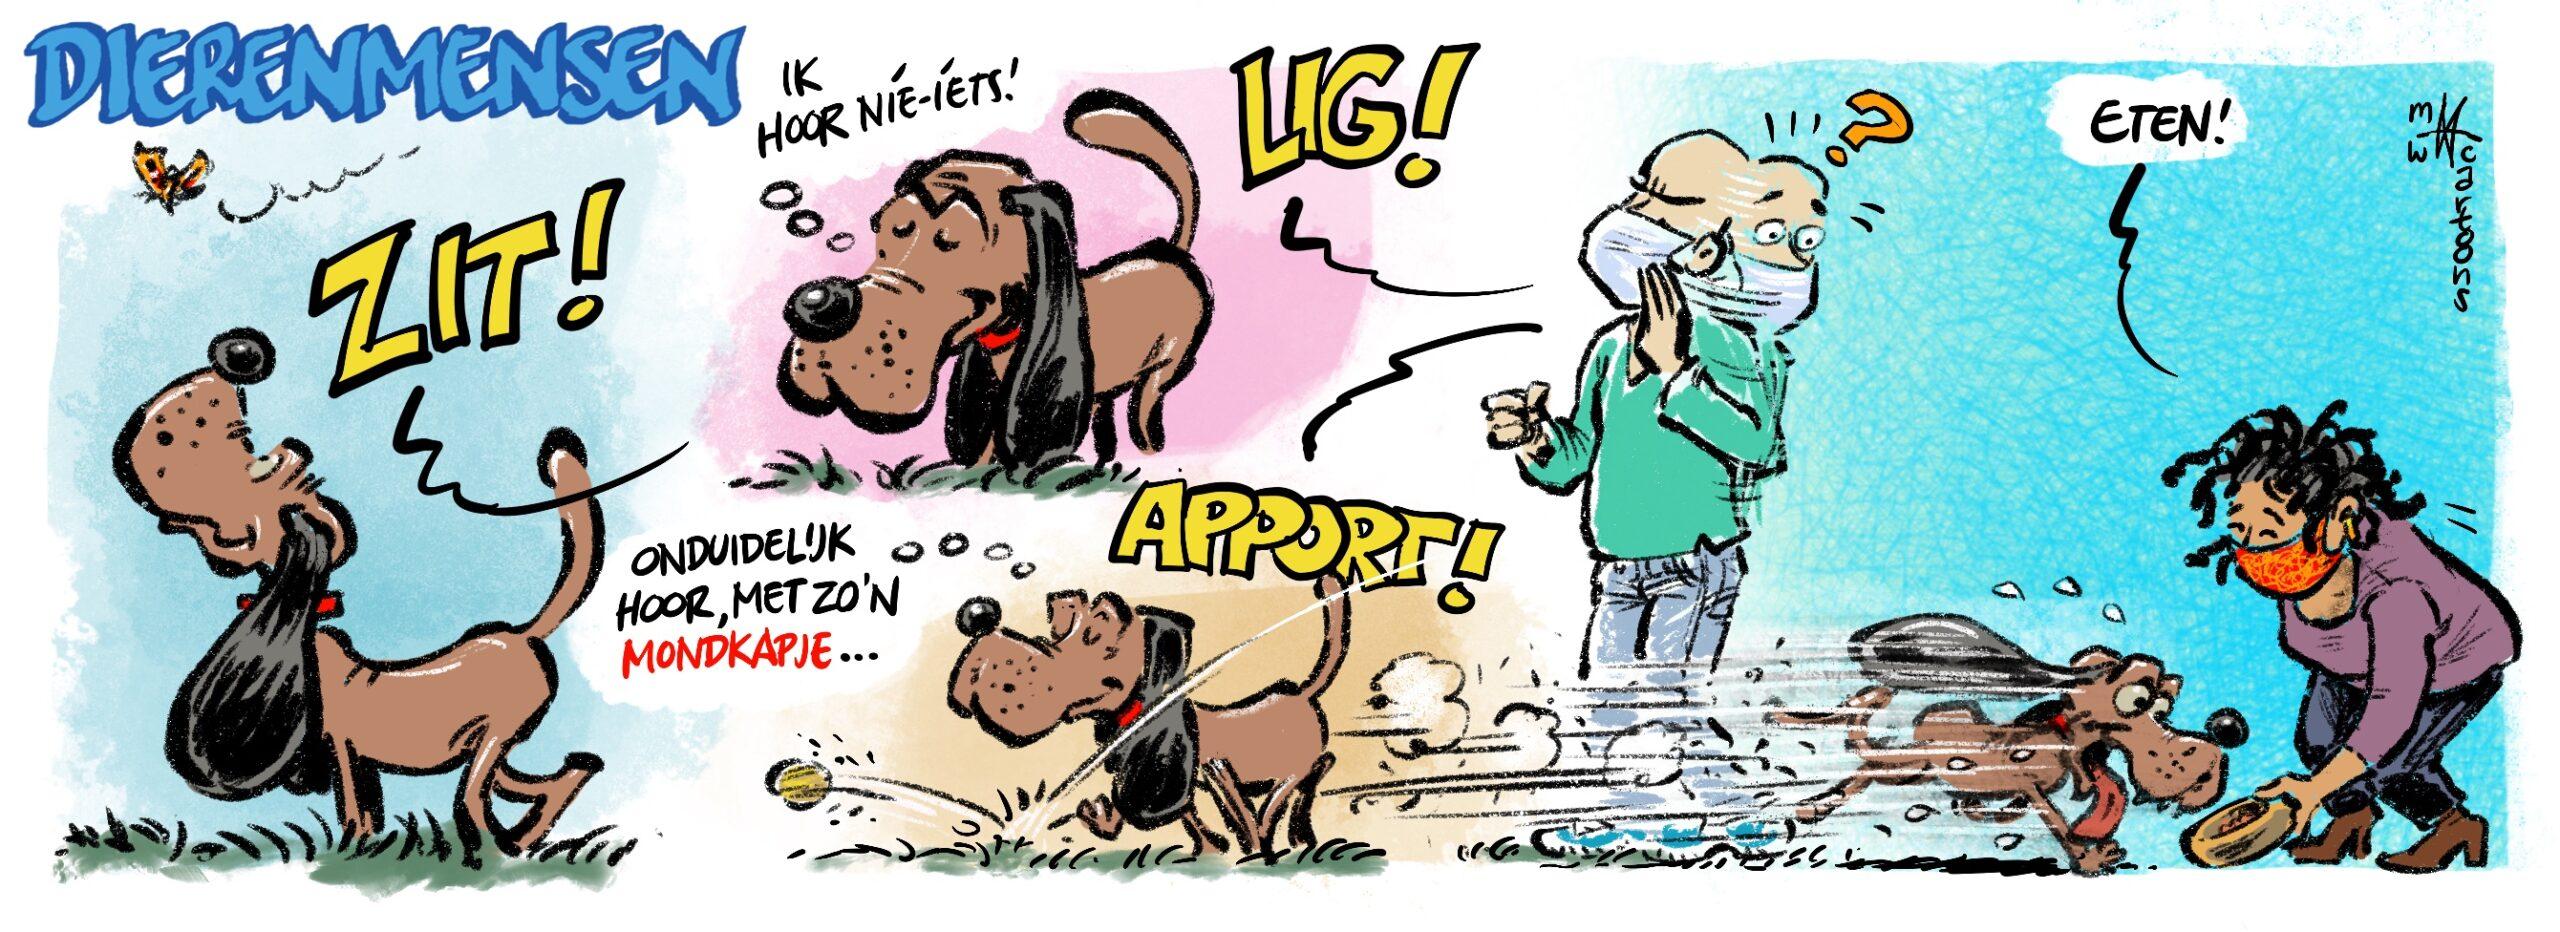 Bekijk hier alle strips die Leids Cartoonist Maarten Wolterink tekende voor Dierentehuis Stevenshage